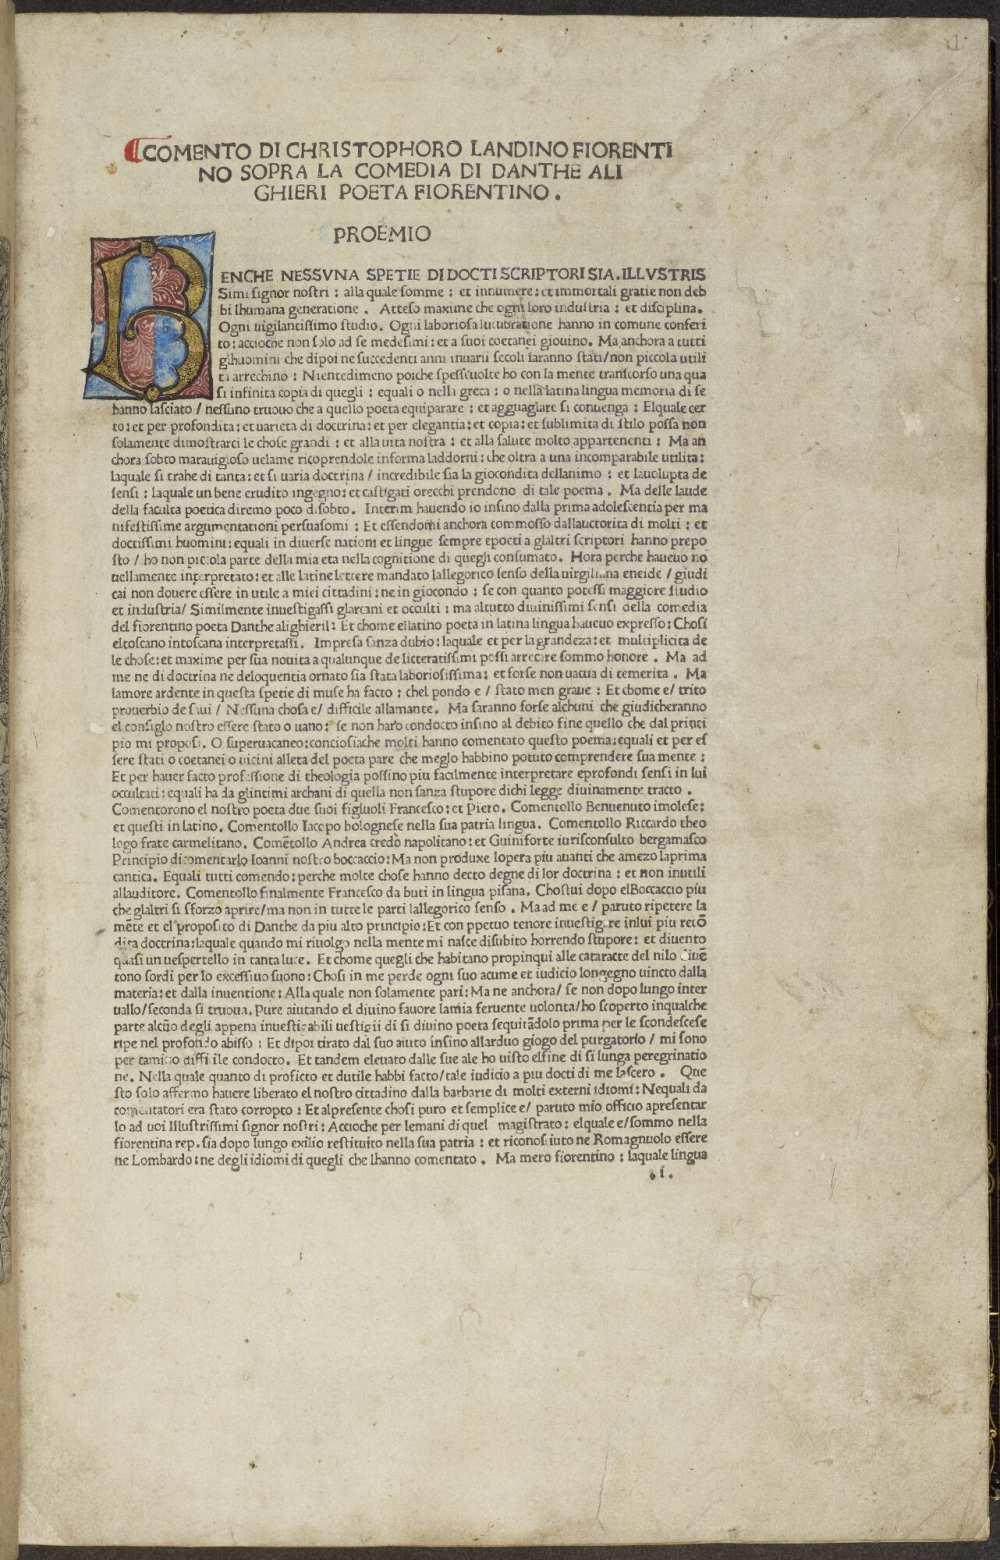 La Commedia (Comm. Cristophorus Landinus). (17280). A kép forrása: University of Manchester, Digital Collection. https://www.digitalcollections.manchester.ac.uk/view/PR-INCU-17280/9